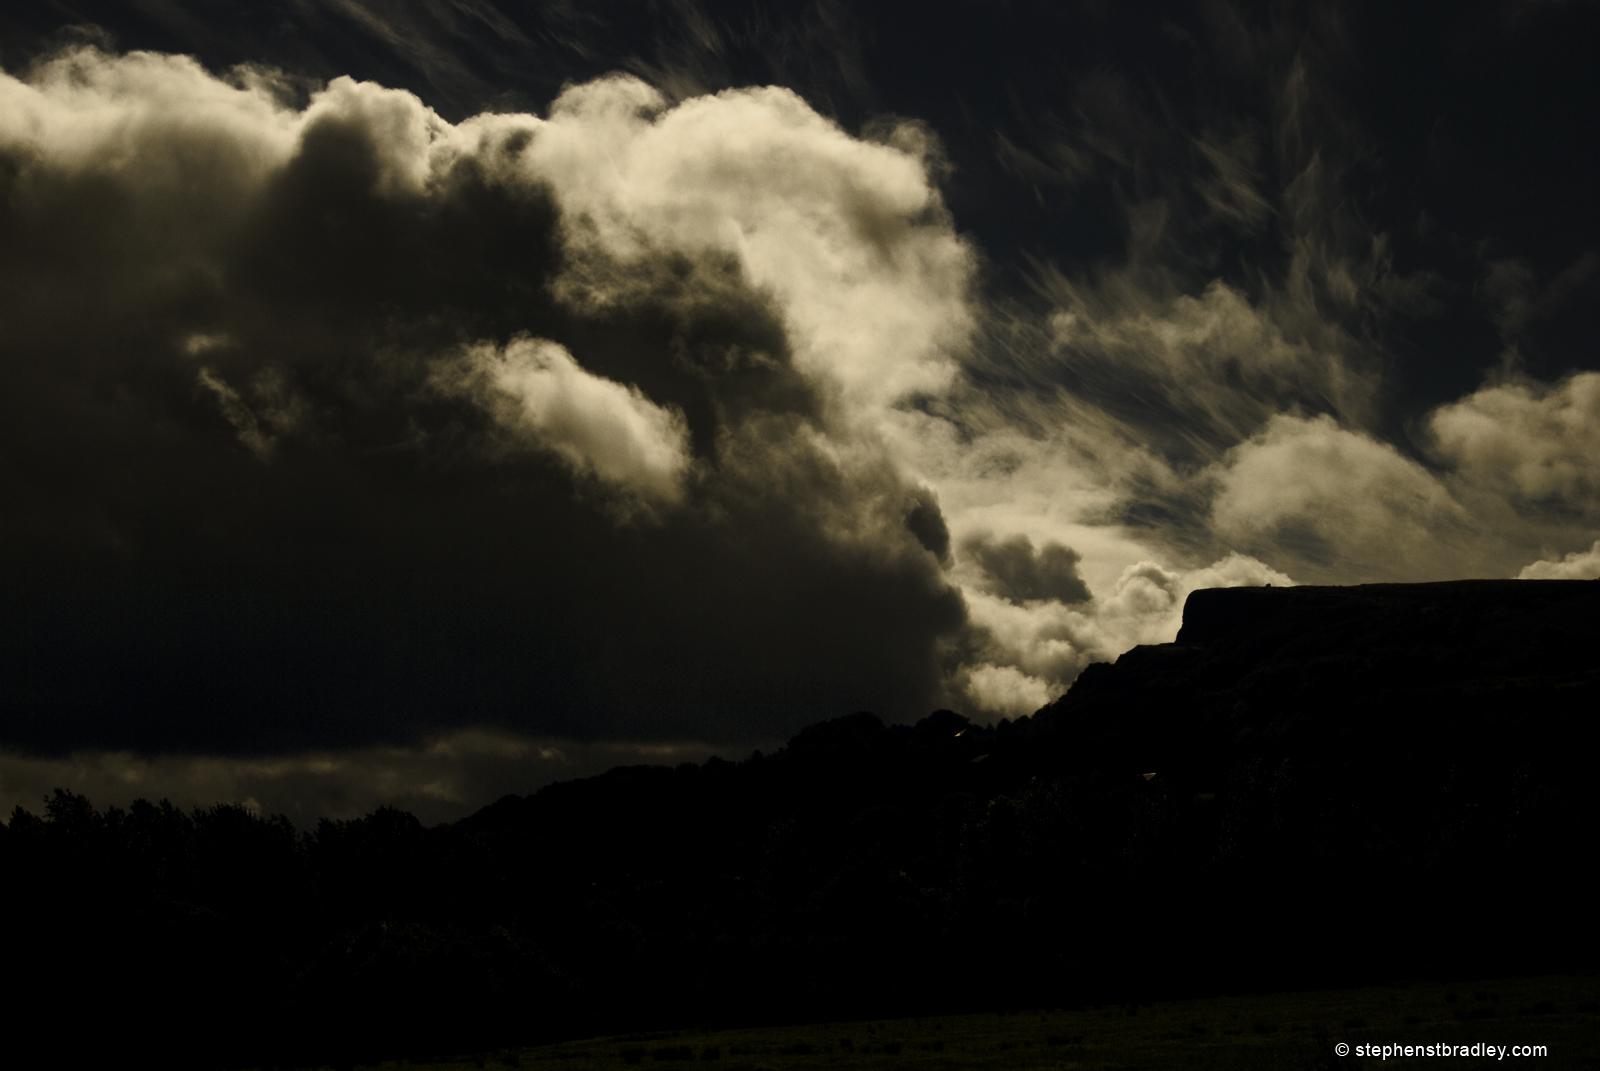 Landscape photograph of storm clouds over Cavehill Belfast, Northern Ireland, UK. Image 4390.